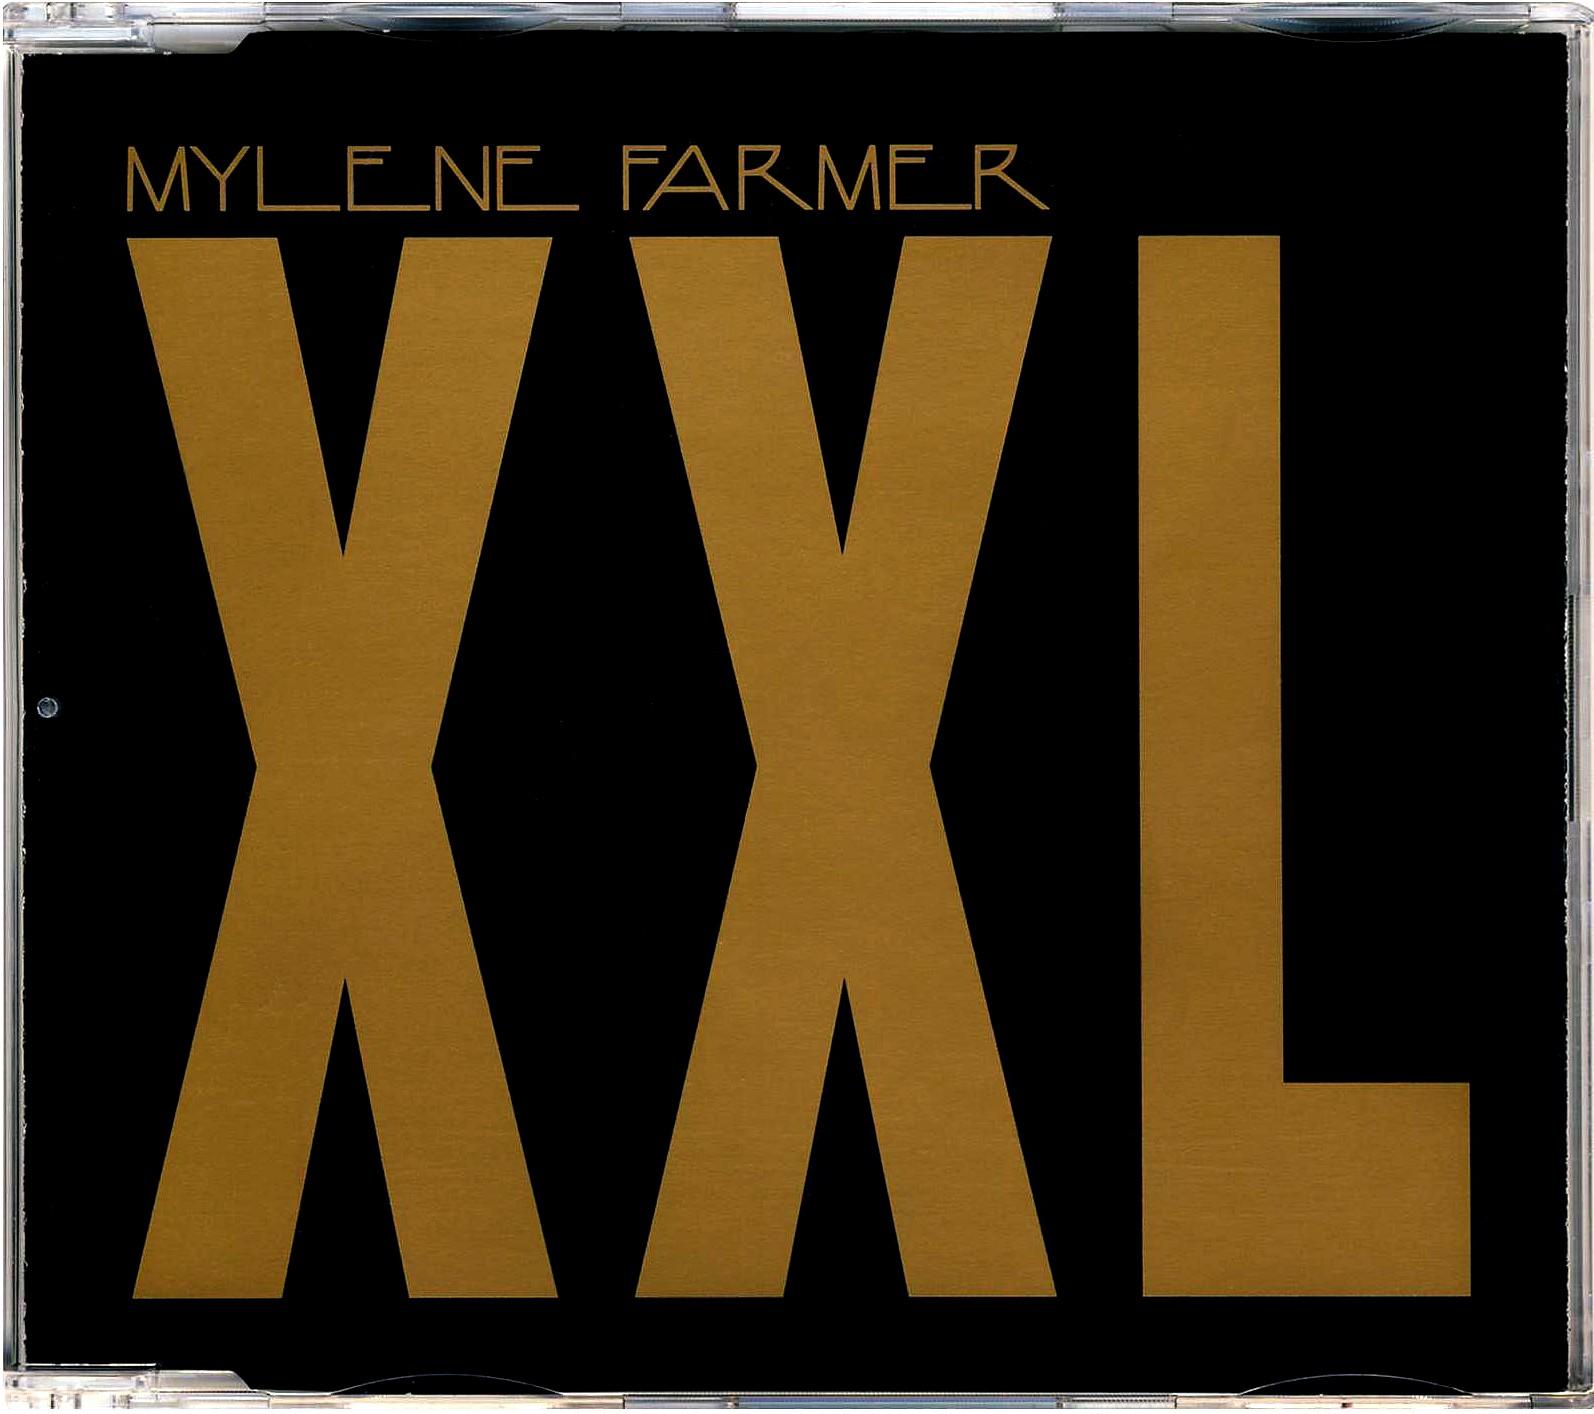 xxl promo image